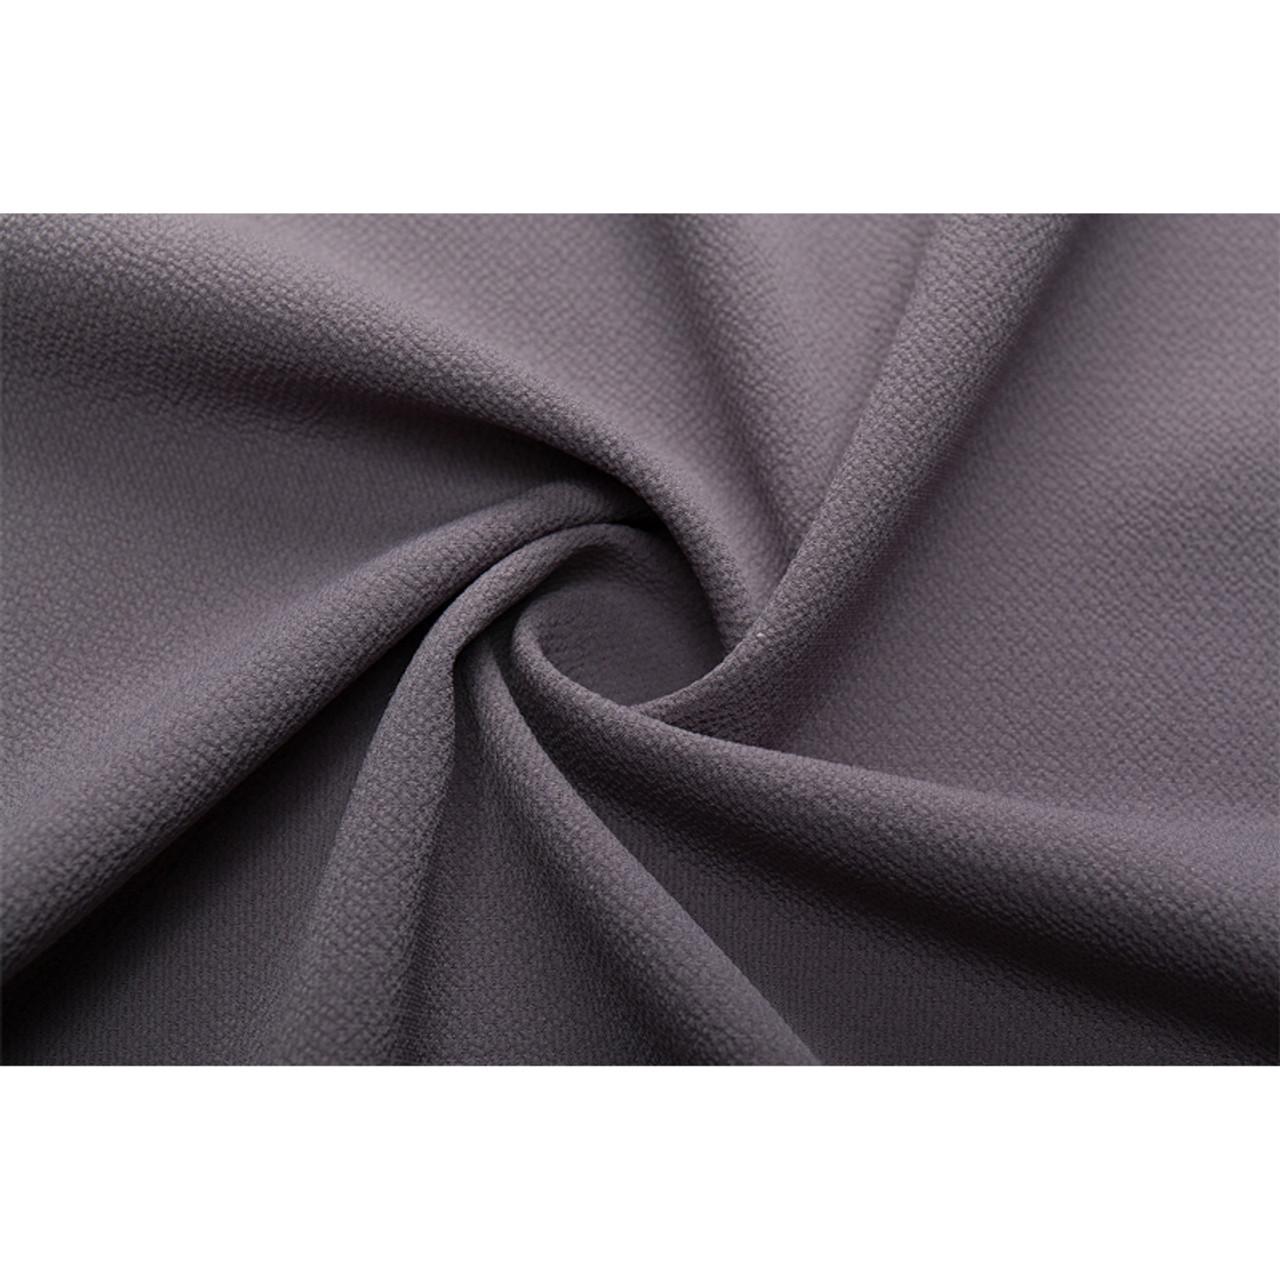 3ec64315f0c ... 2017 Big Yard Tops Women V-neck Chiffon Blouses 3 4 Sleeve Female Shirt  ...